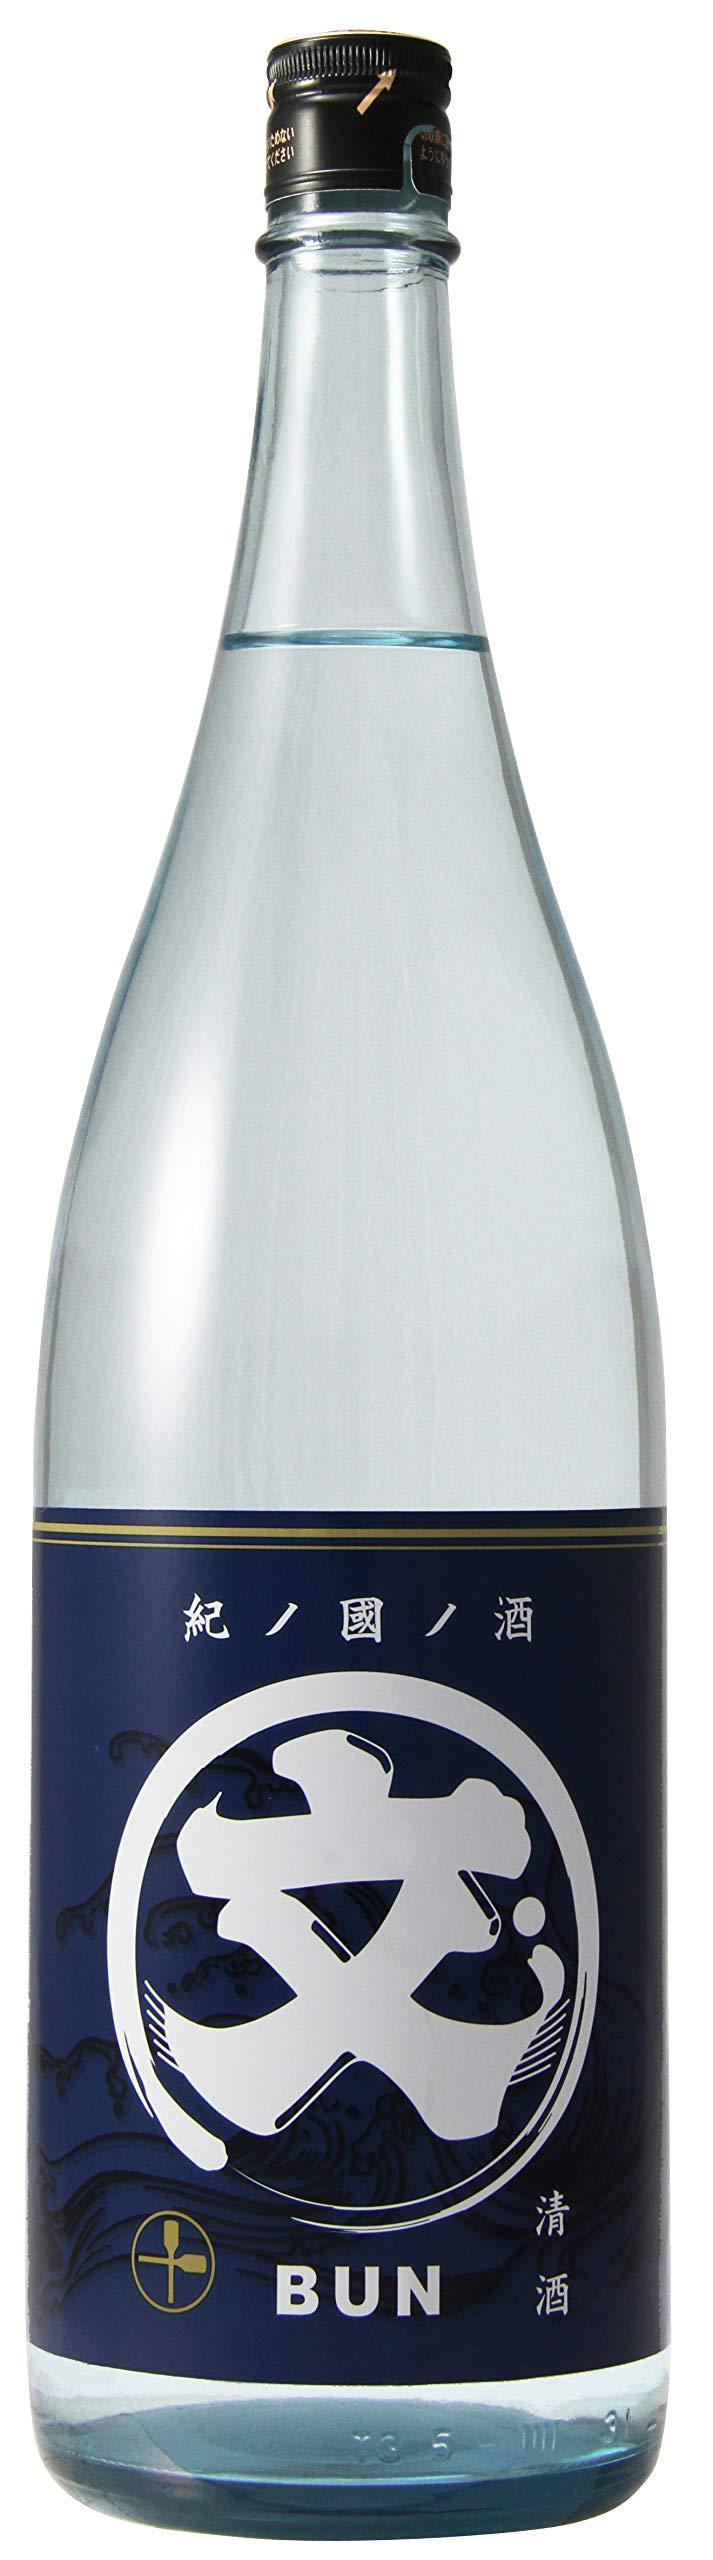 吟醸「文」 瓶 1800ml 中野BC 吟醸「文」 瓶 1800ml